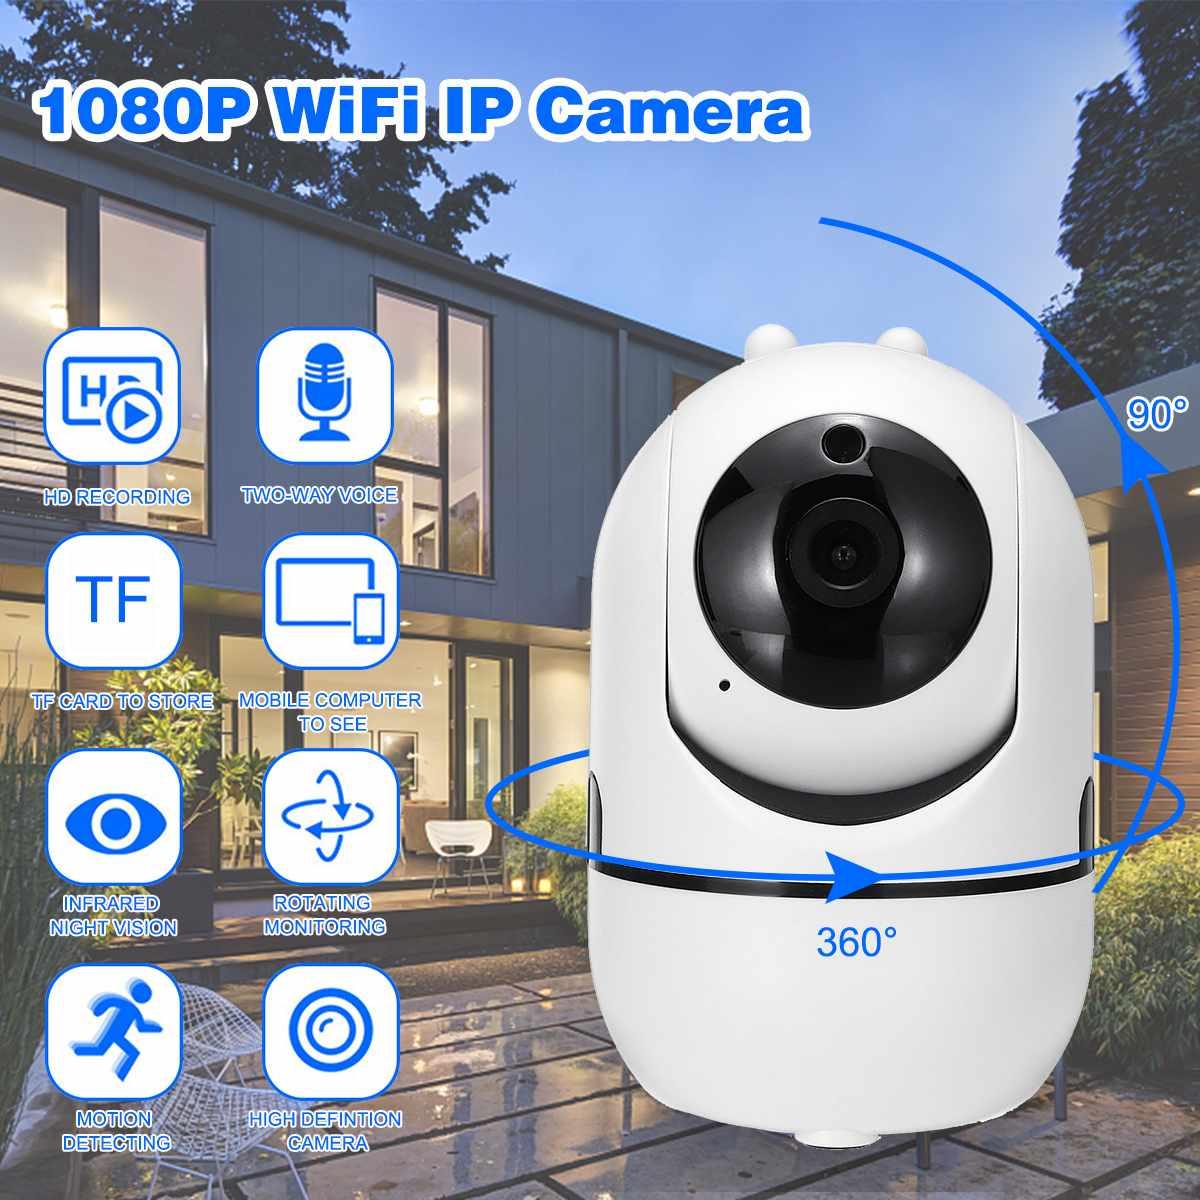 Cloud Wireless IP Camera Intelligent Auto Tracking Of Human Home Security Surveillance CCTV Network Mini Wifi CamCloud Wireless IP Camera Intelligent Auto Tracking Of Human Home Security Surveillance CCTV Network Mini Wifi Cam